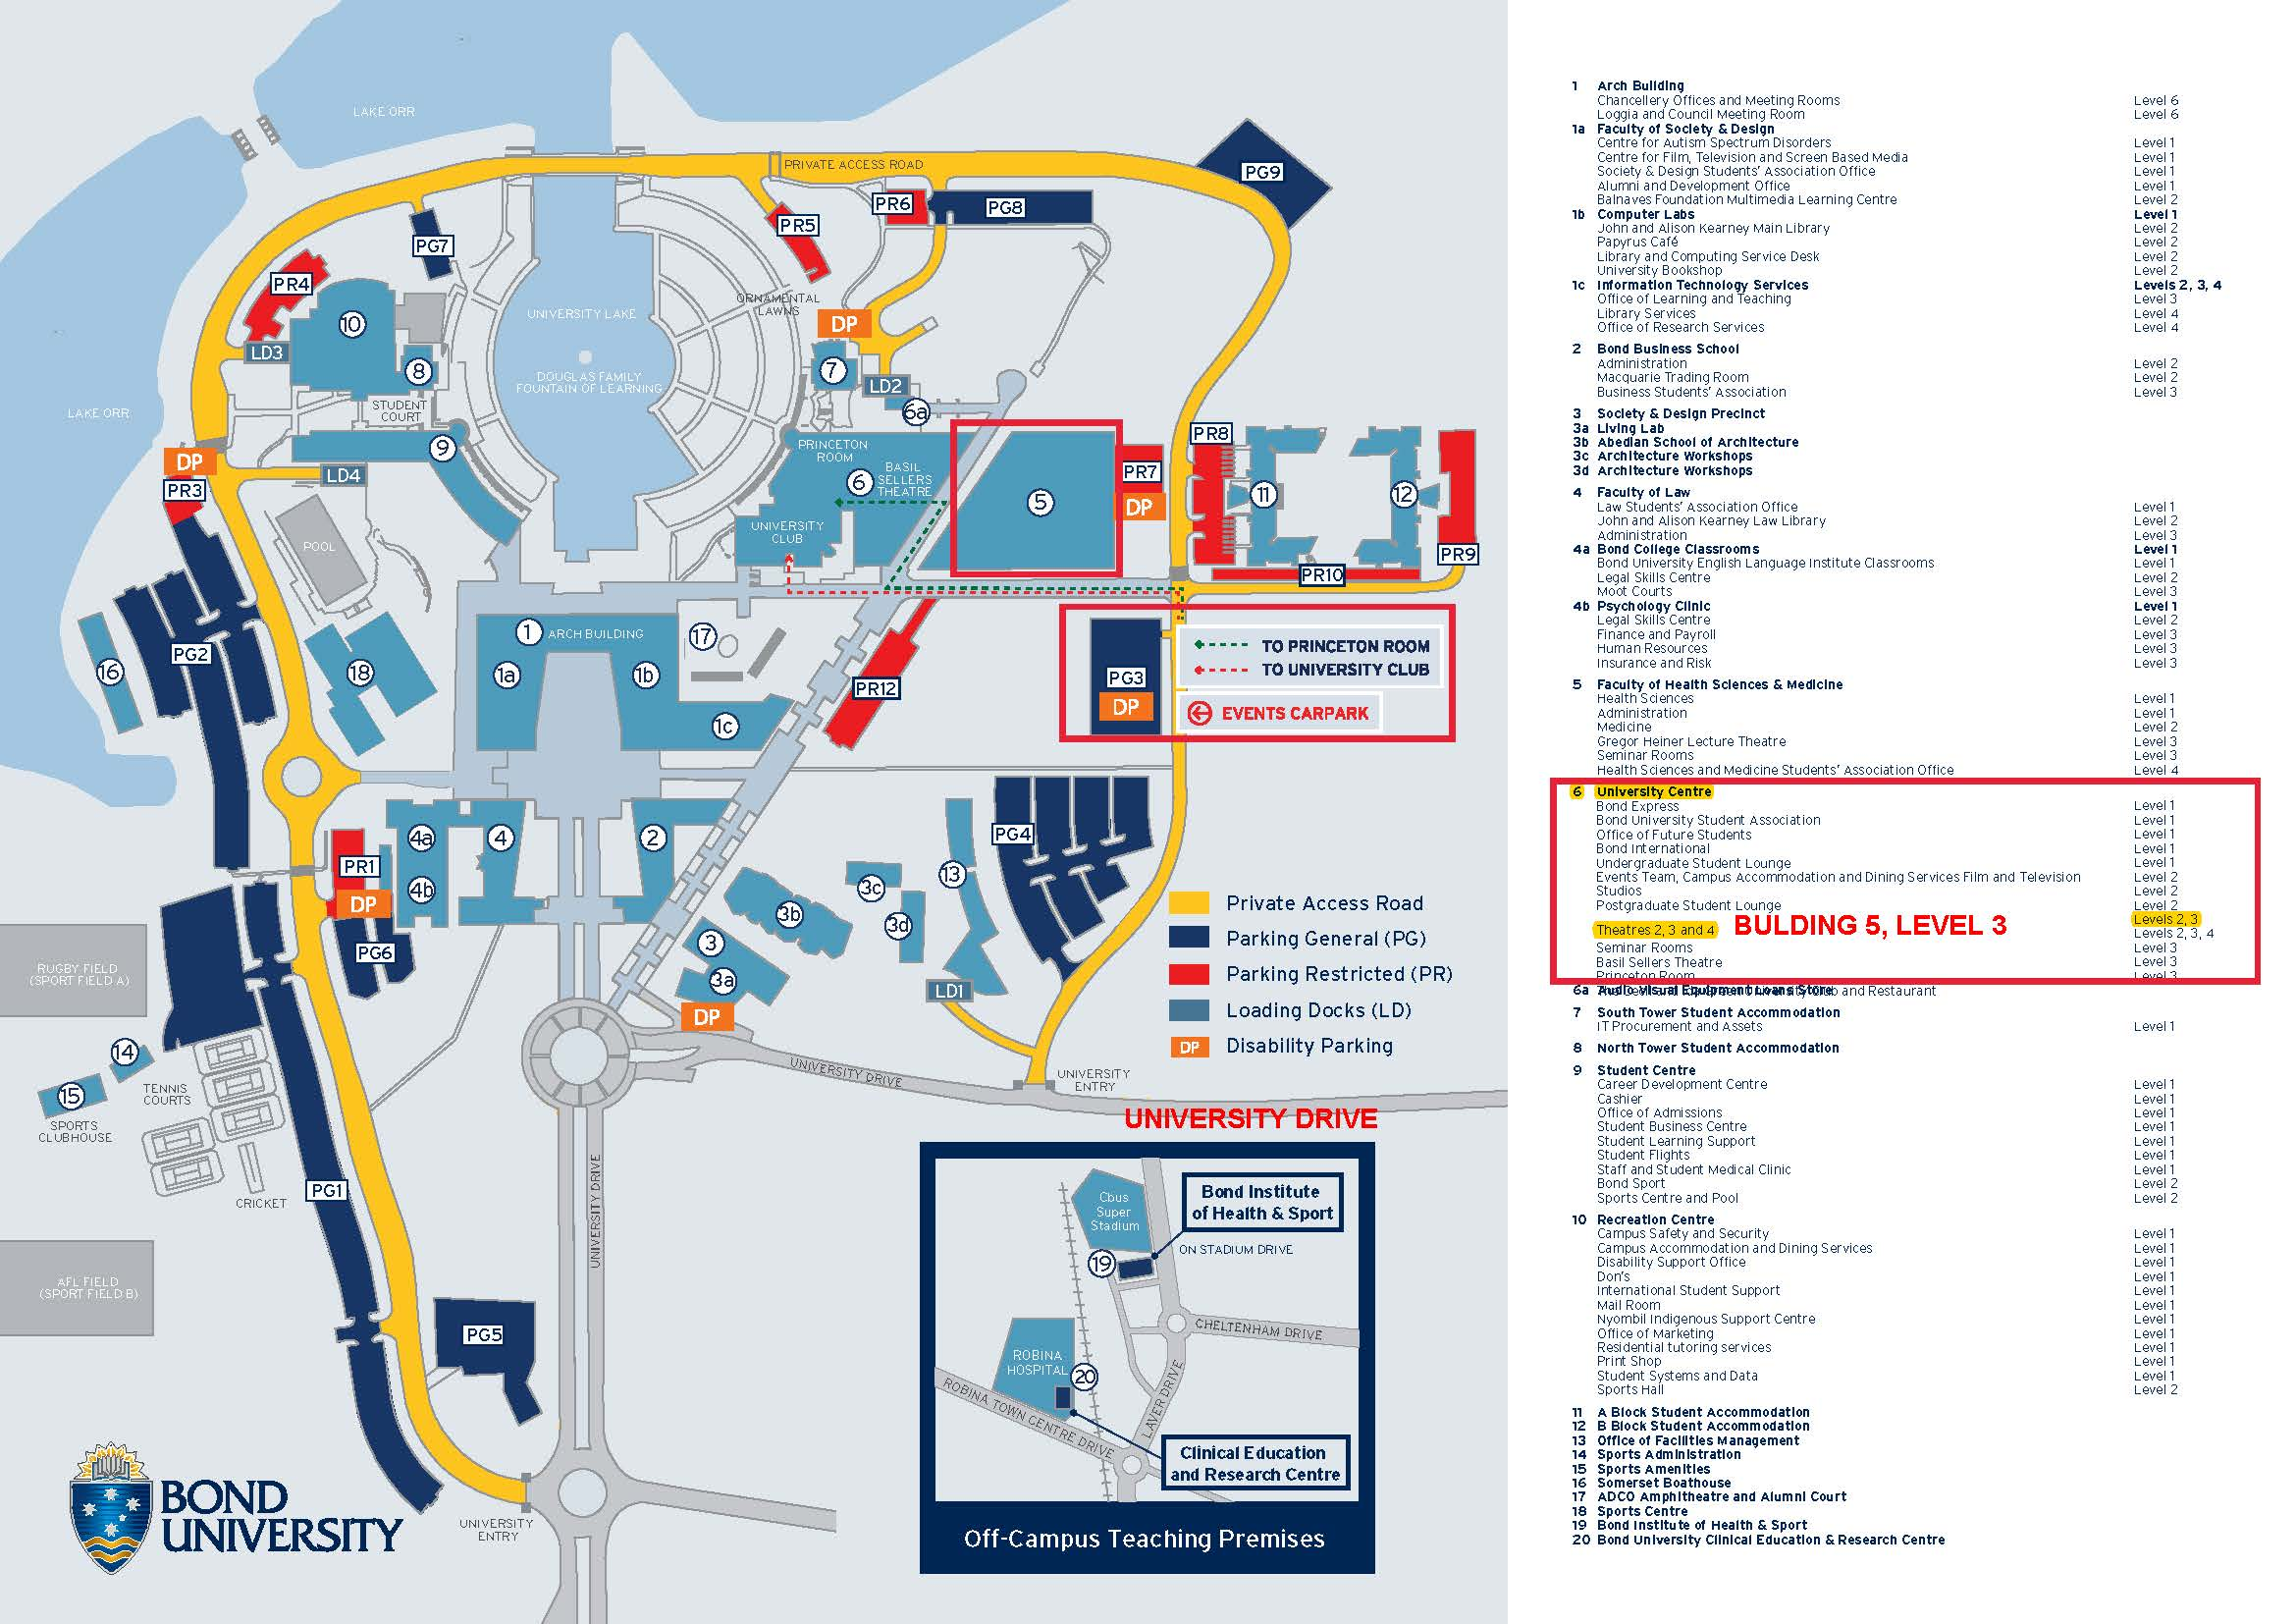 Bond University Campus Map